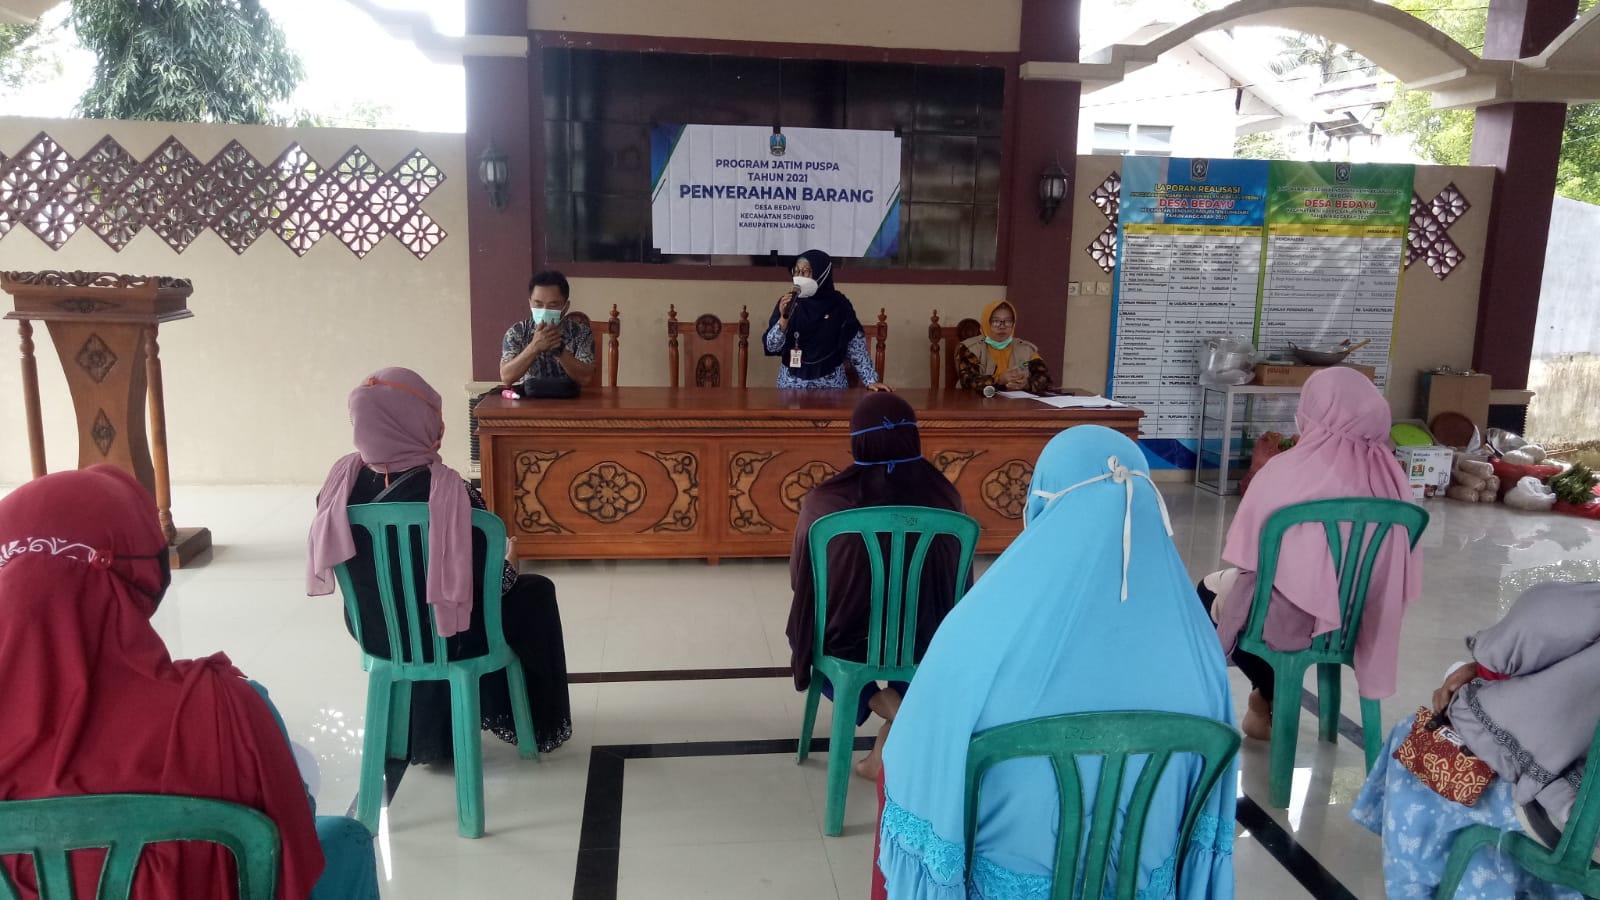 Acara Penyerahan Barang Bantuan Program Jatim Puspa TA 2021 Provinsi Jatim